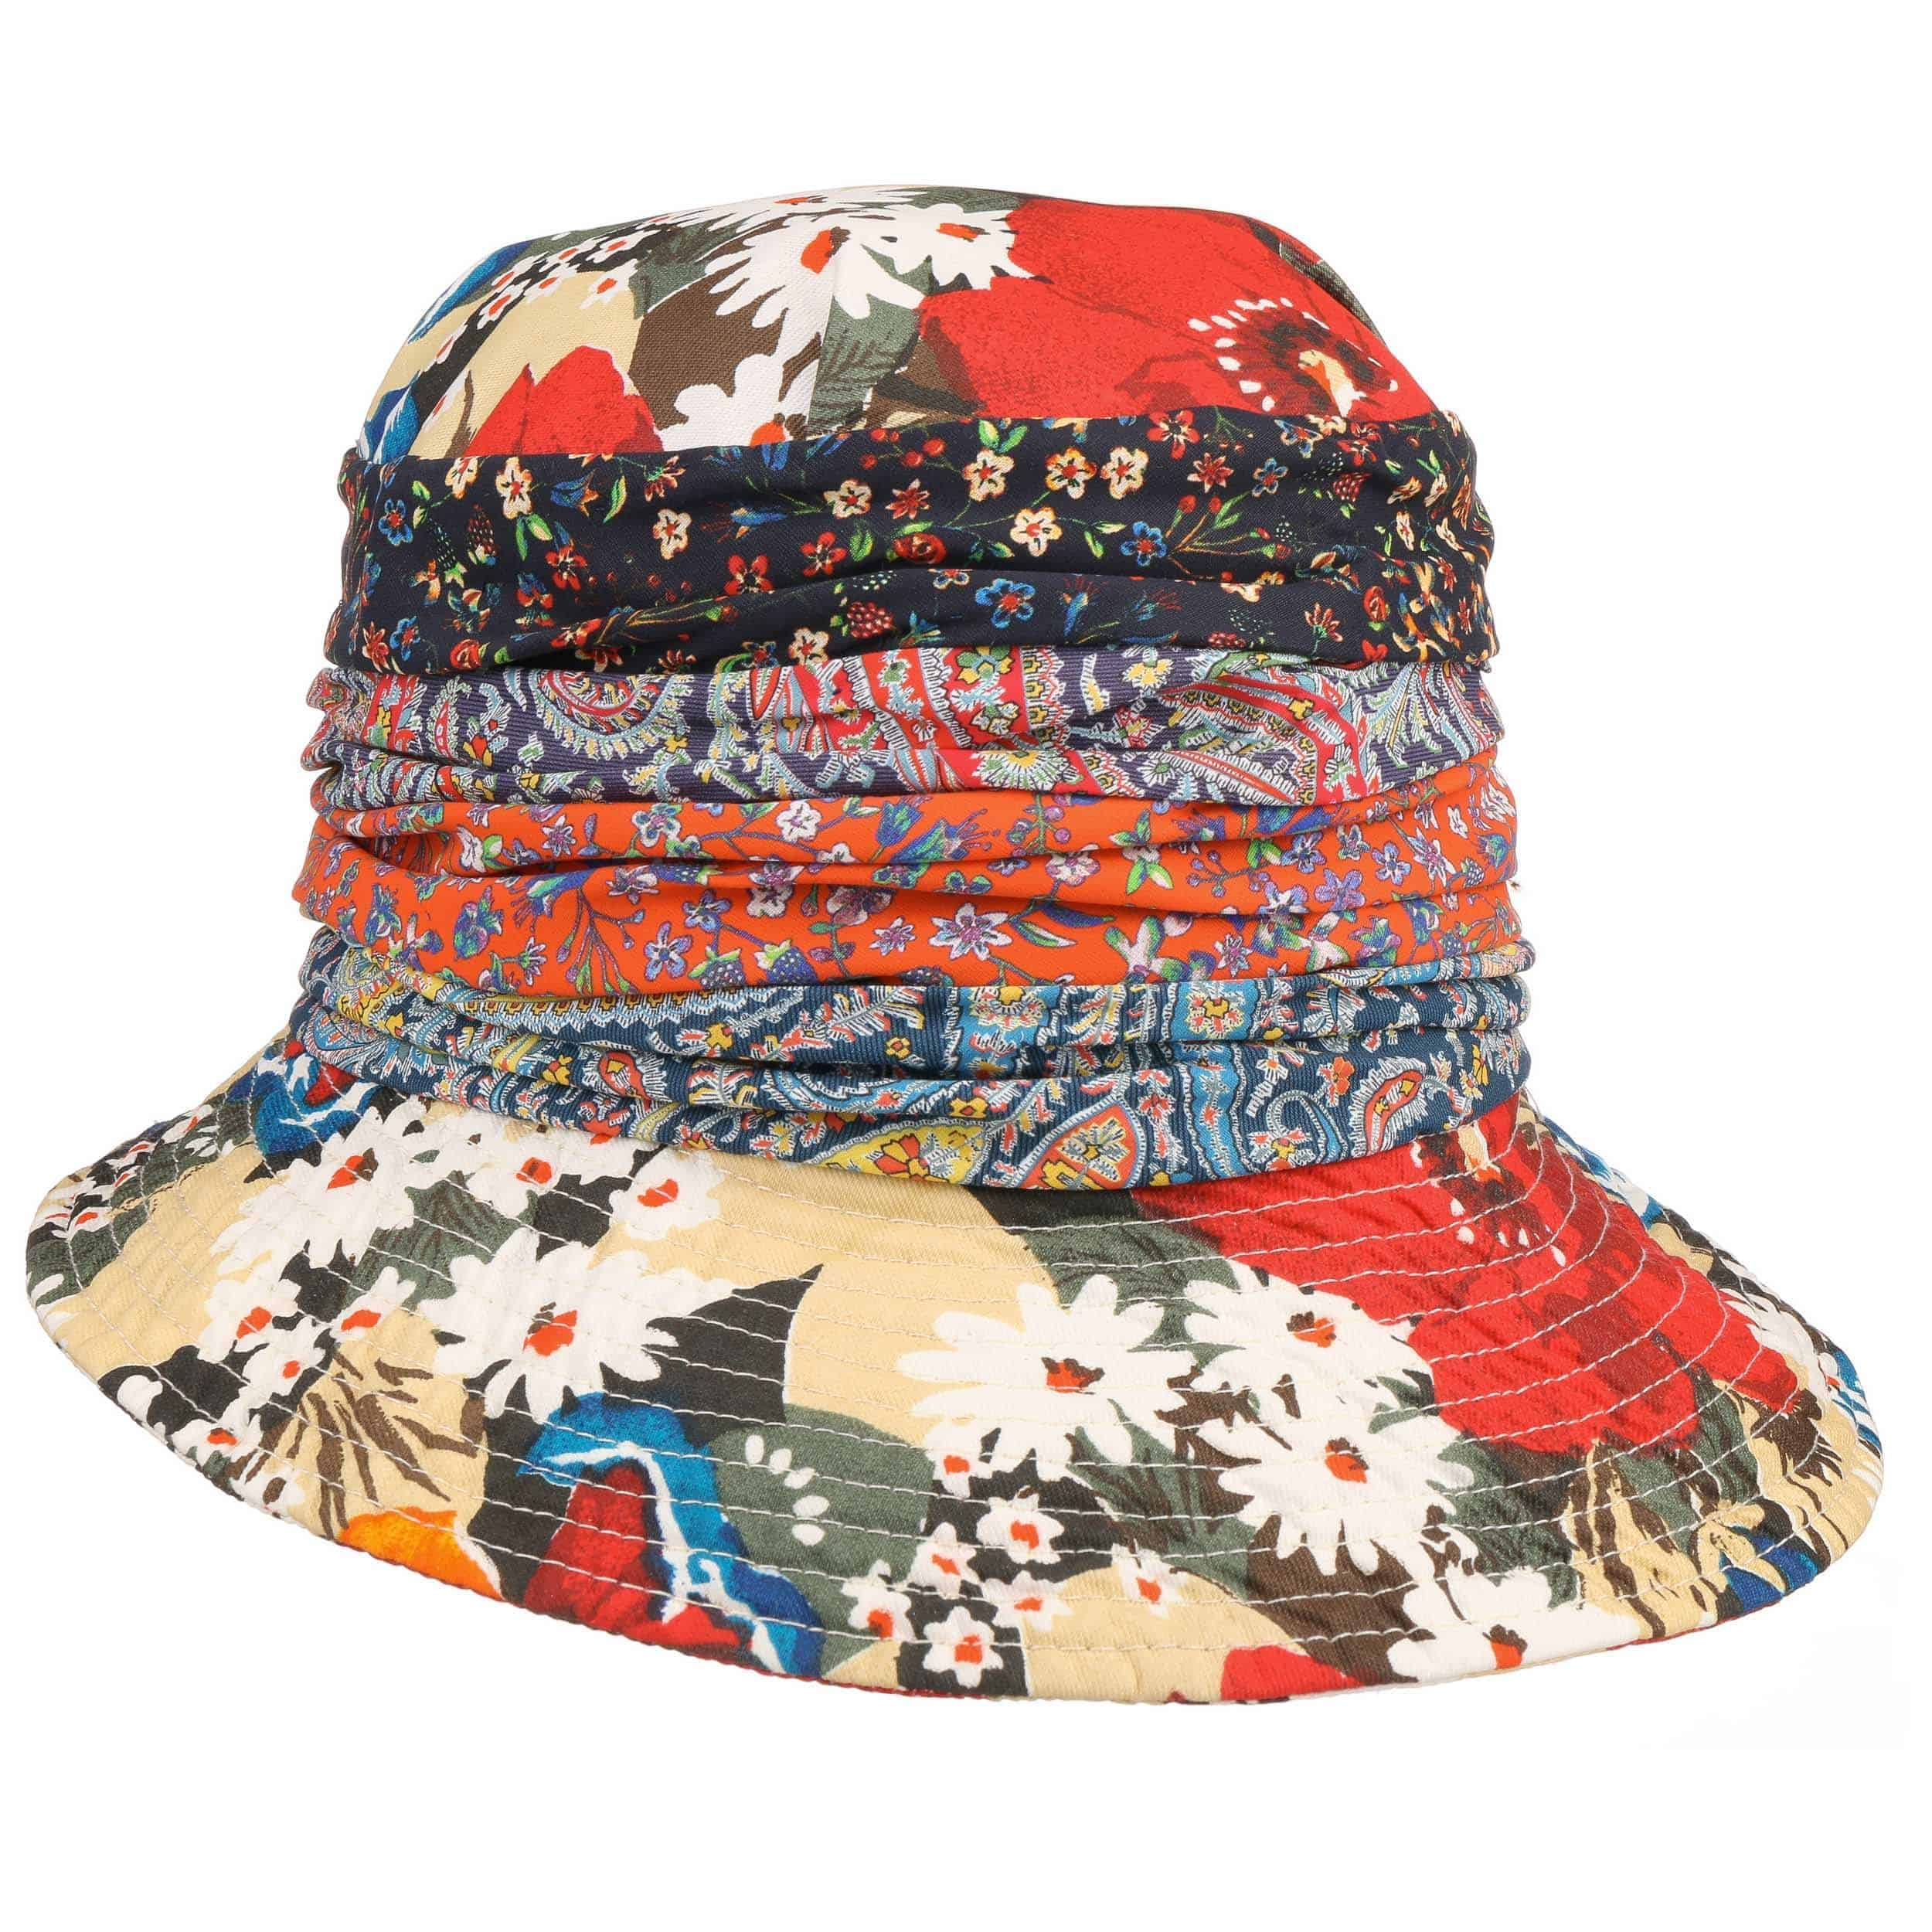 Cappello da Donna Flower Paisley by GREVI - 129,00